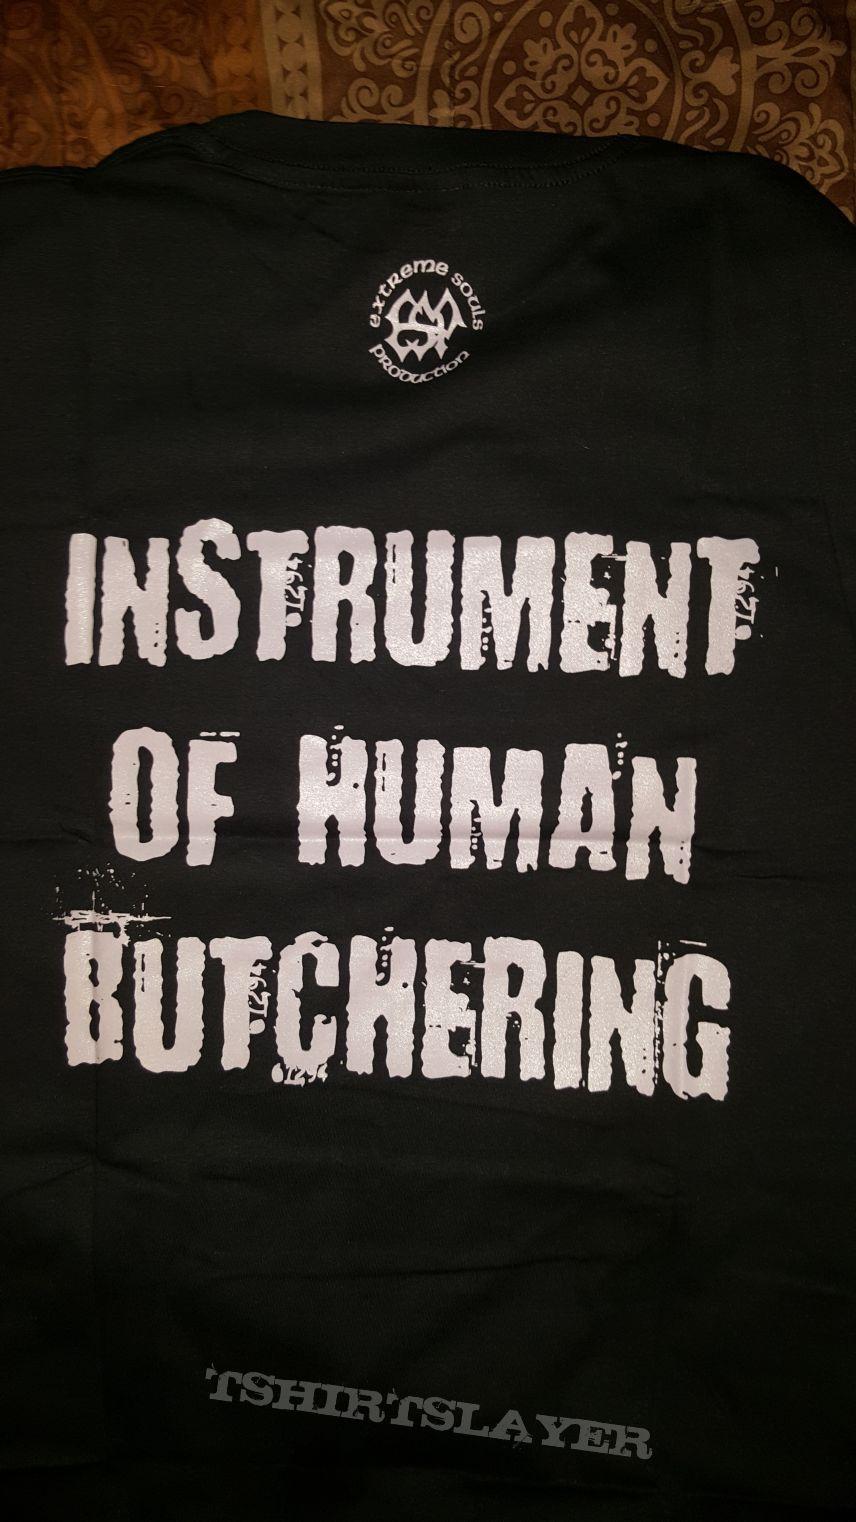 Germinativum - Instrument of Human Butchering